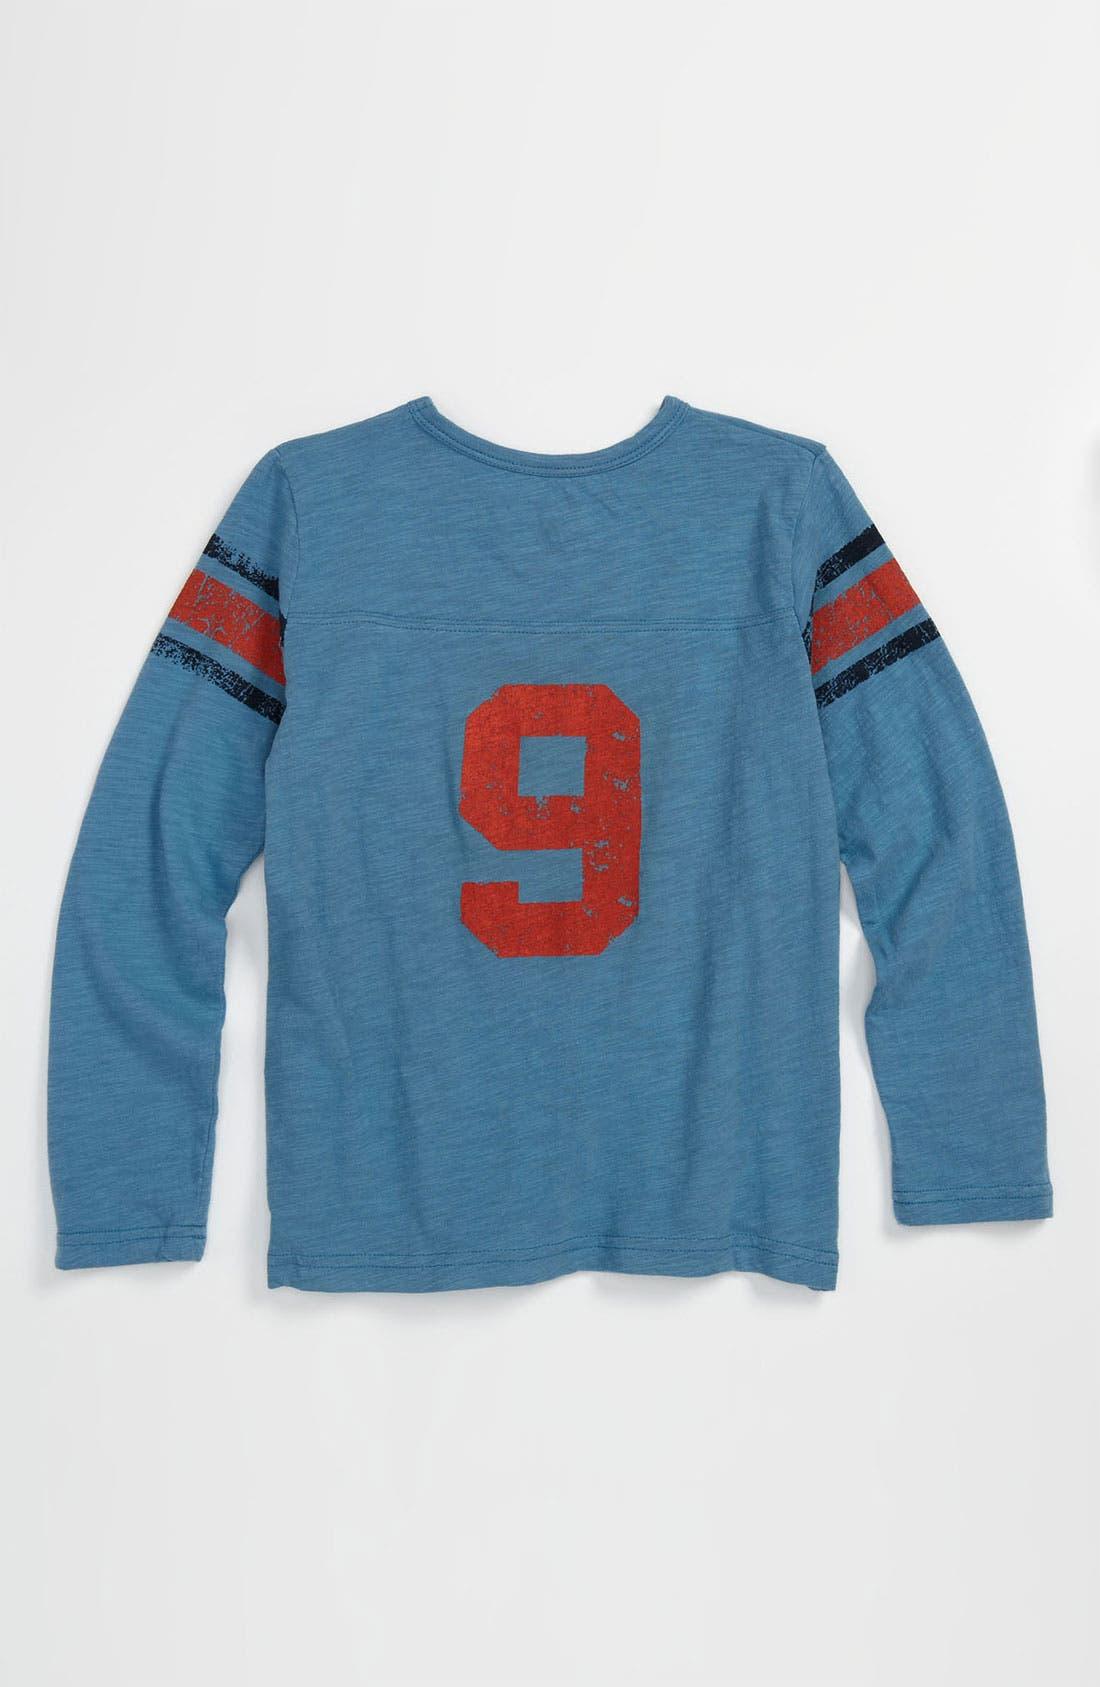 Alternate Image 2  - Peek Long Sleeve Jersey Top (Toddler, Little Boys & Big Boys)